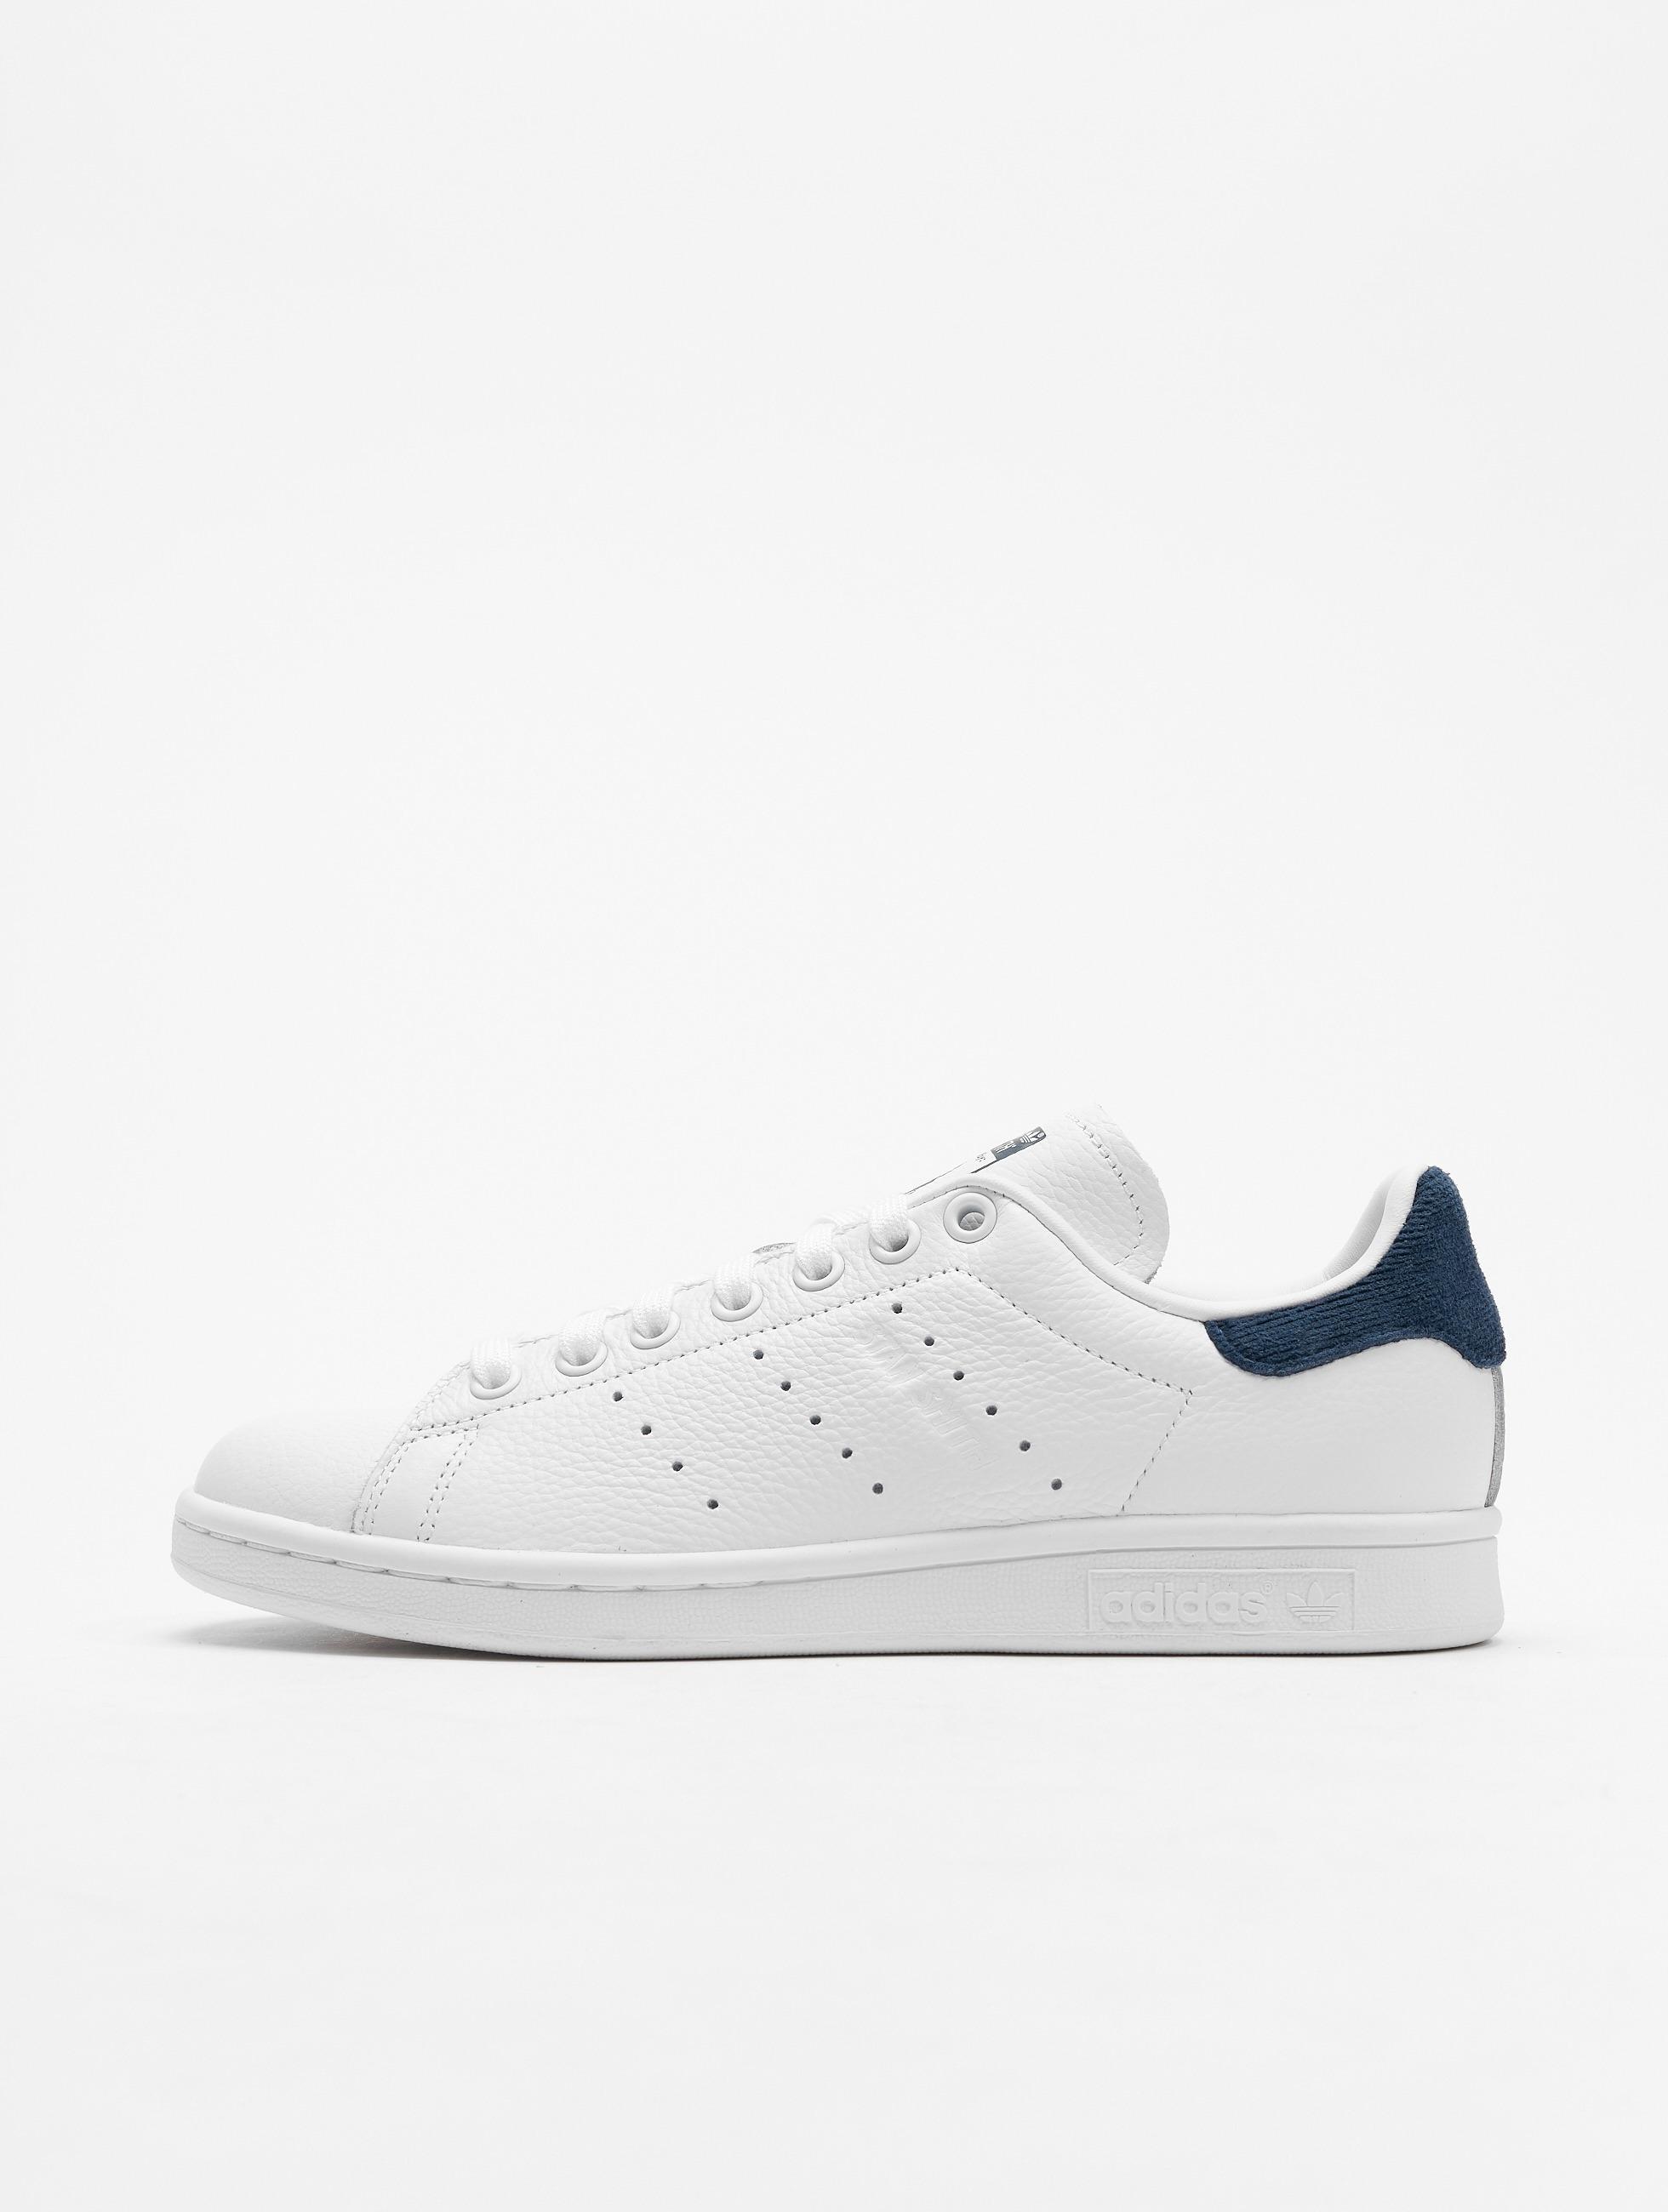 02ebfd27e55 adidas originals schoen / sneaker Stan Smith W in wit 542903